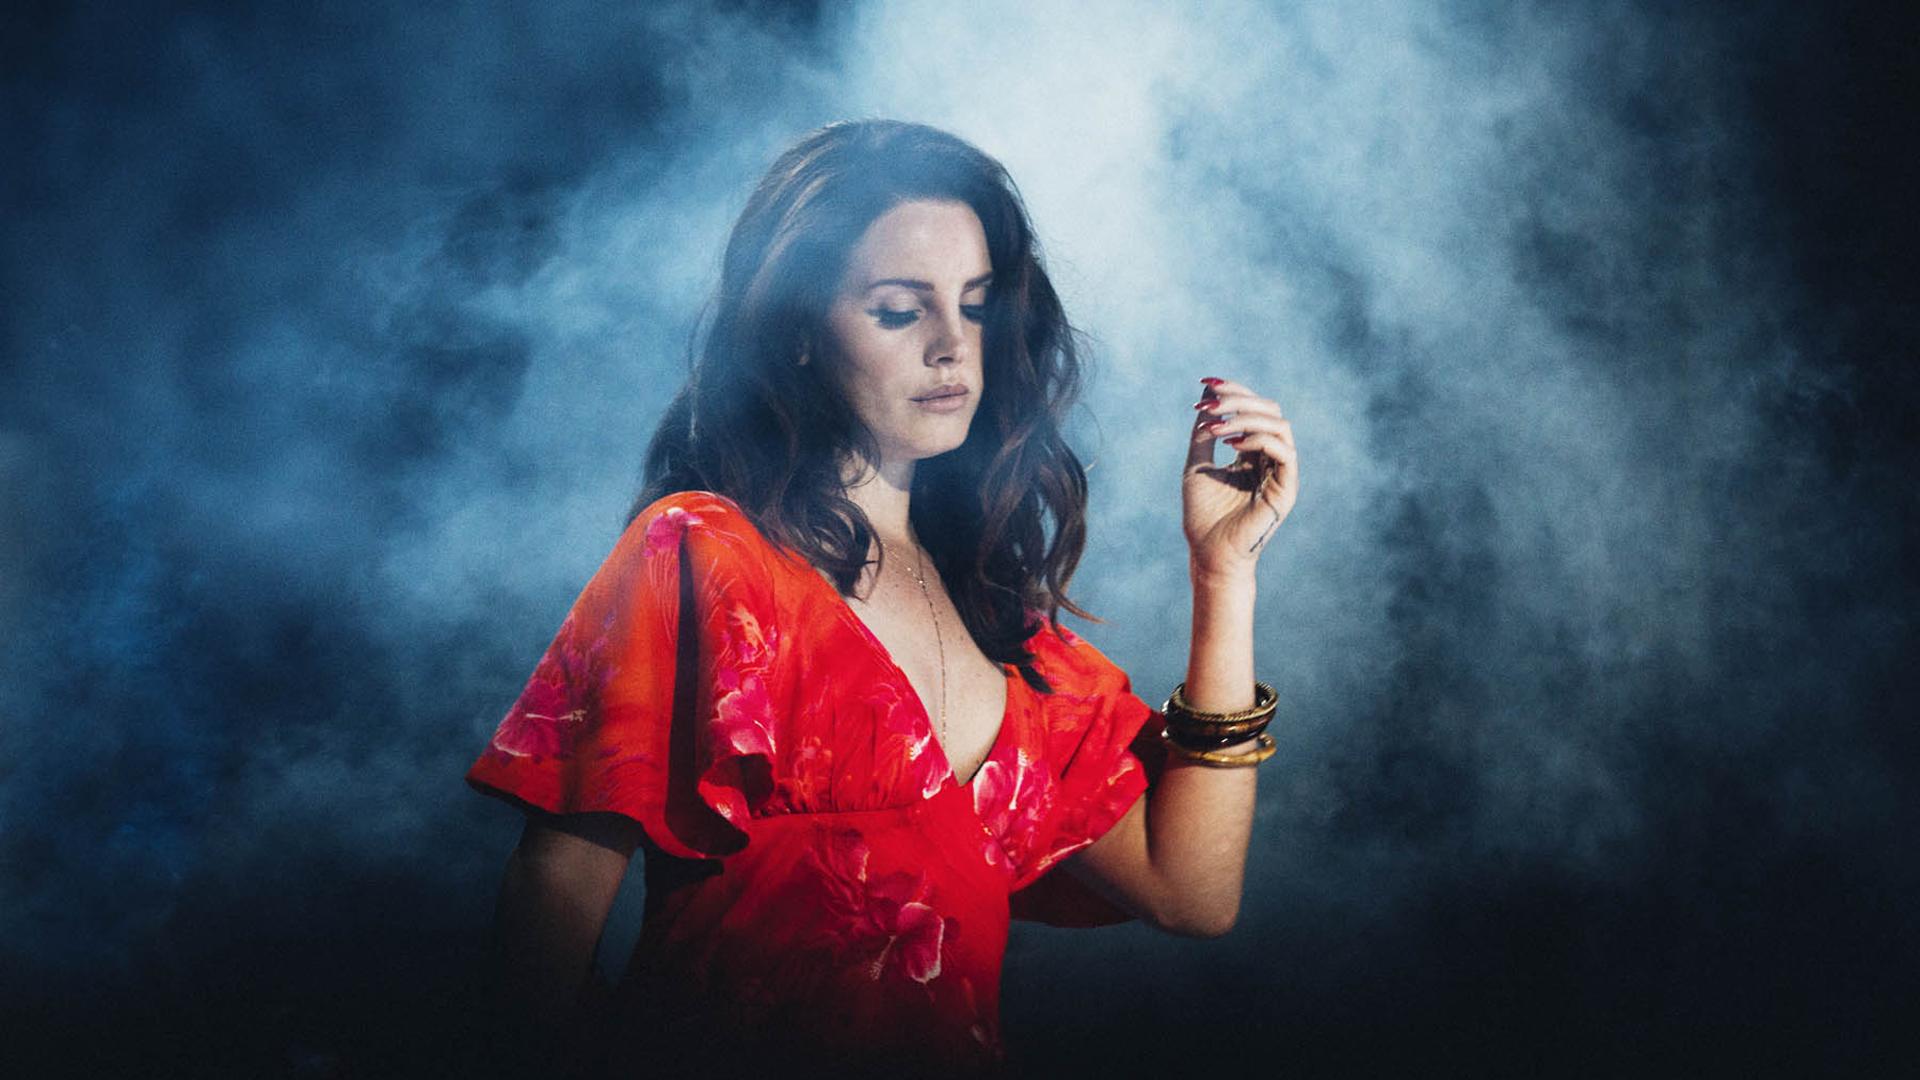 Lana Del Rey For Desktop